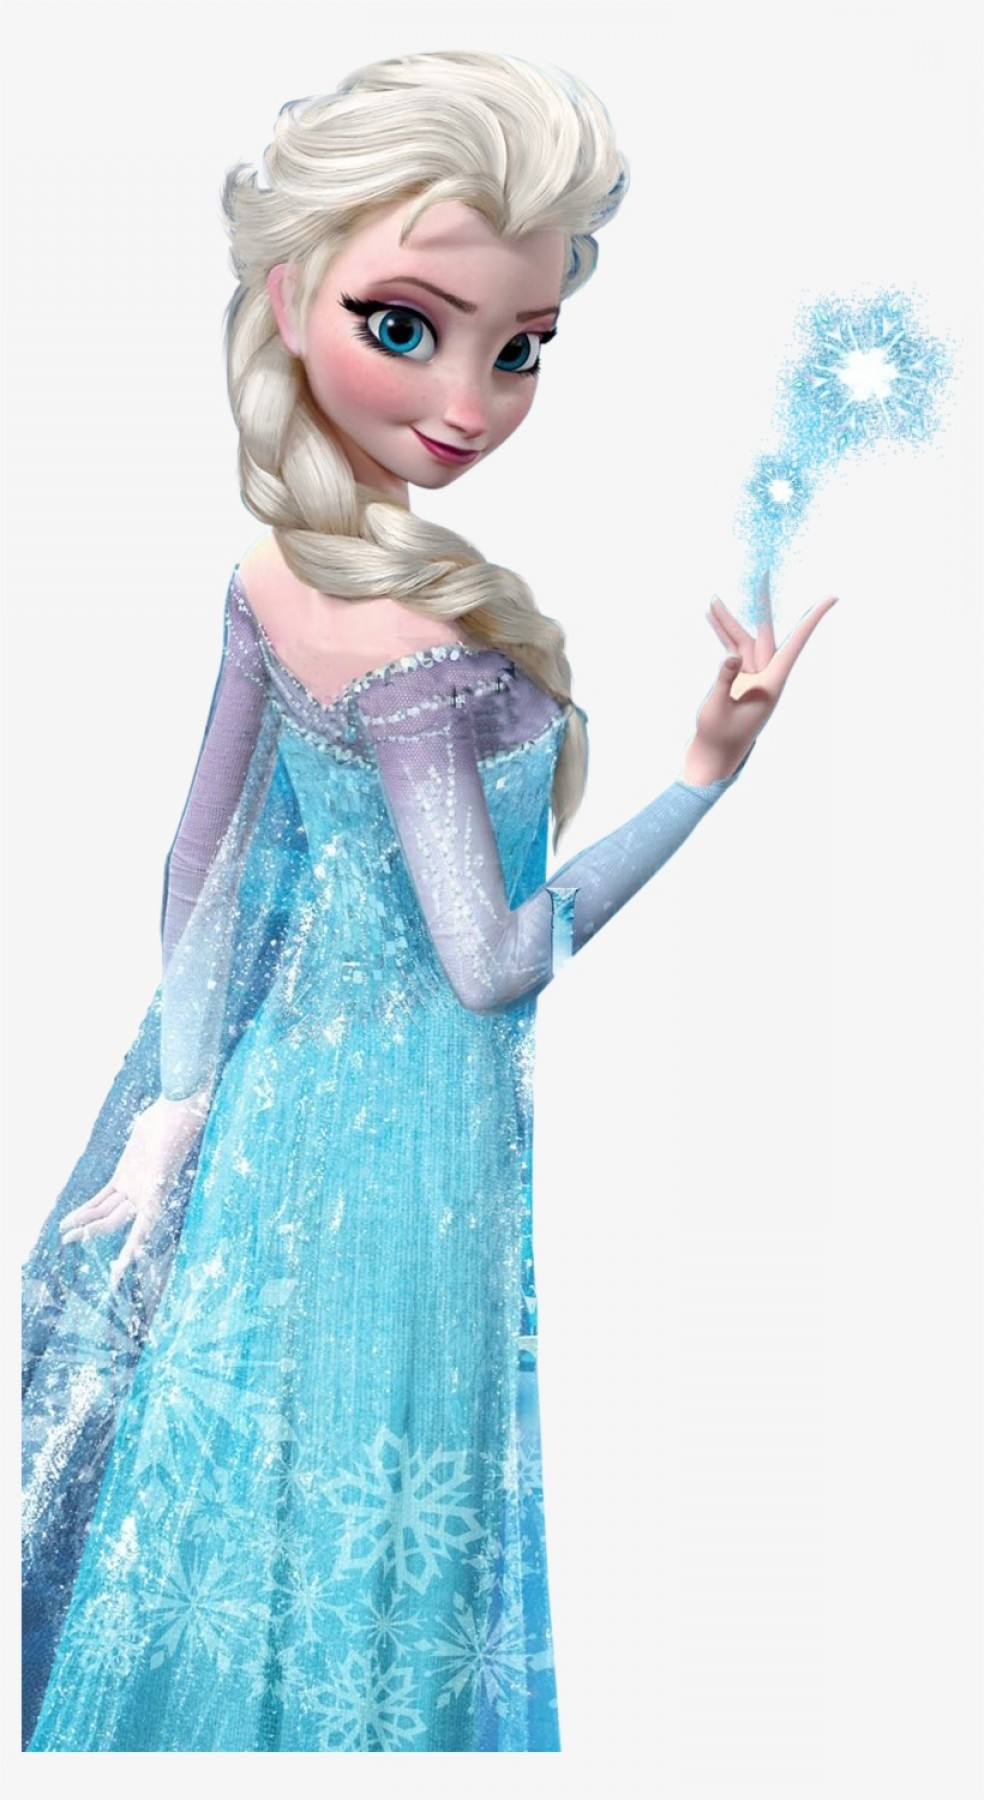 Uaoiyuoqfrozen Png Image Elsa Frozen Png.